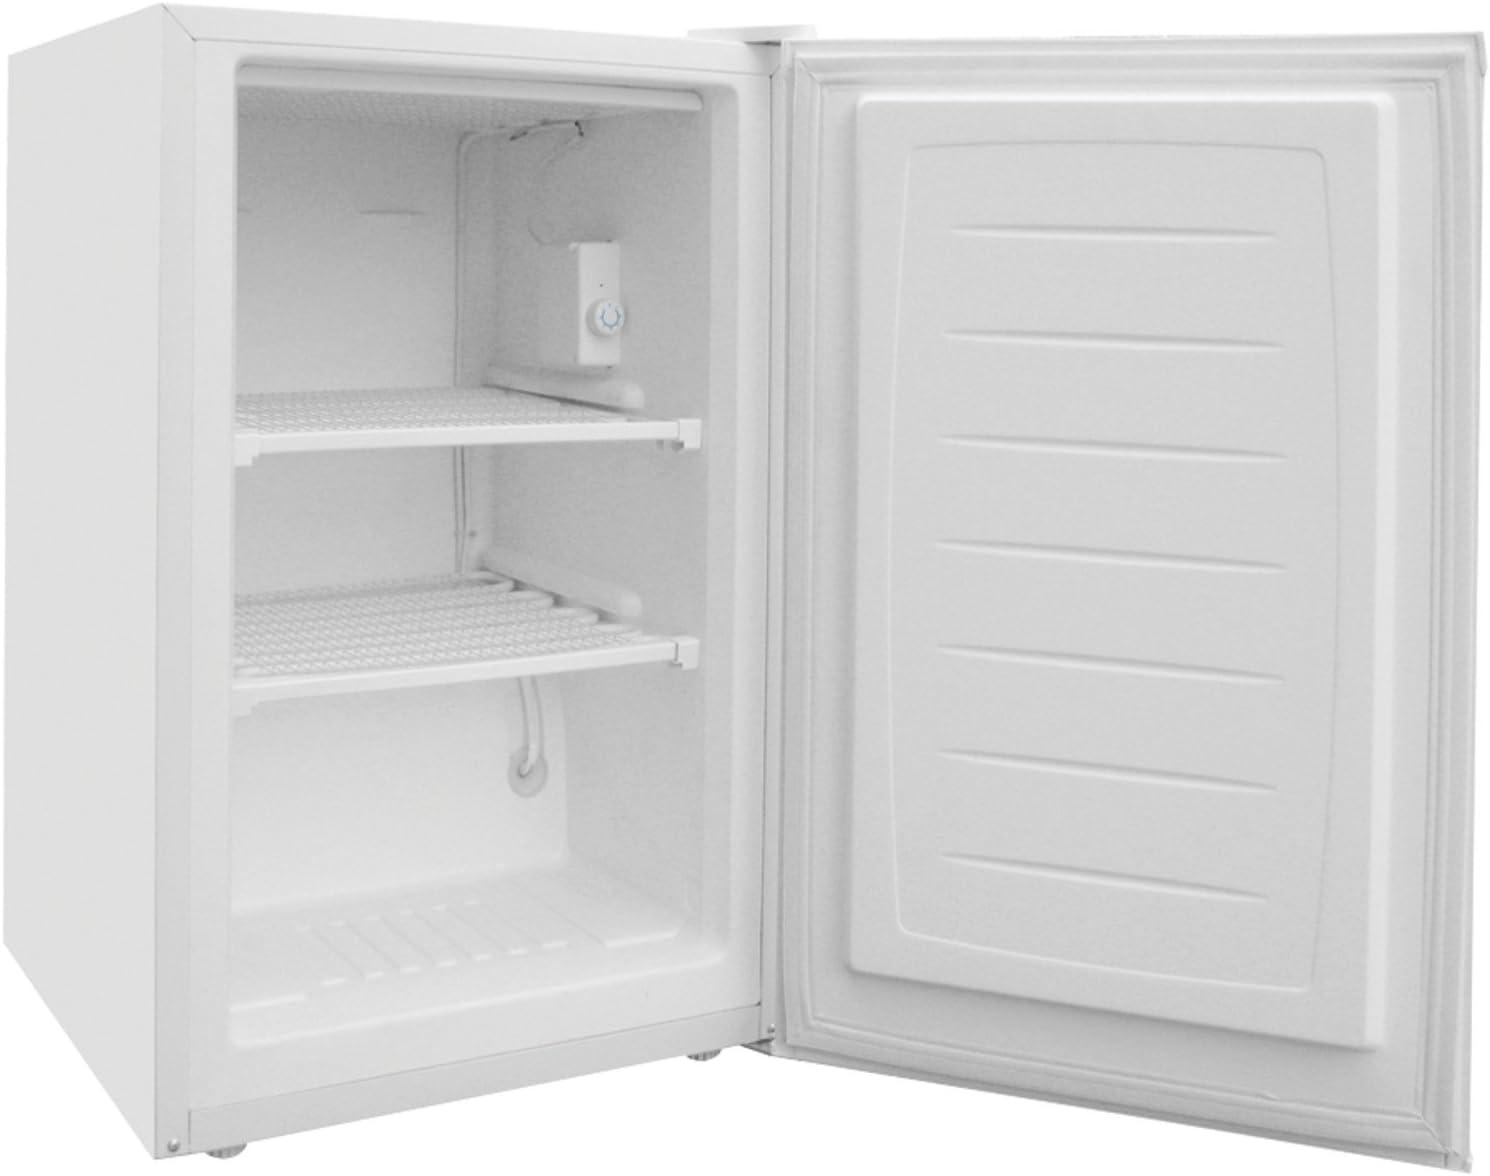 MAGIC CHEF MCUF3W2 3 Cubic-ft Upright Freezer Home, garden & living